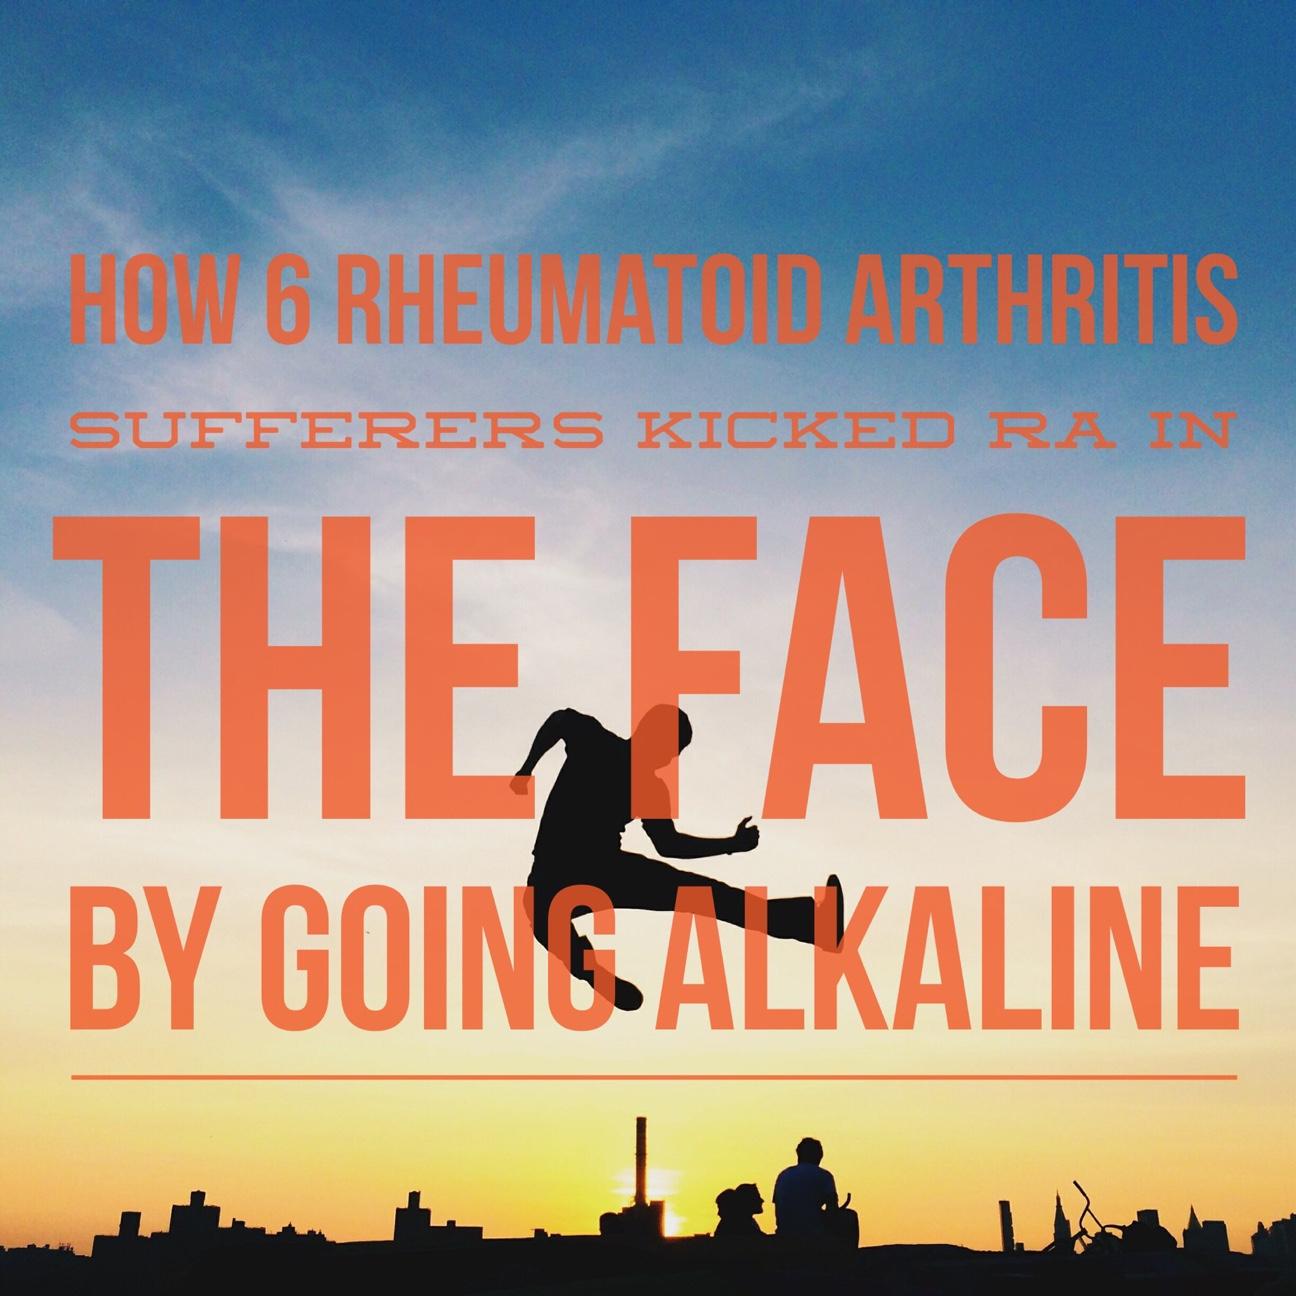 alkaline diet rheumatoid arthritis